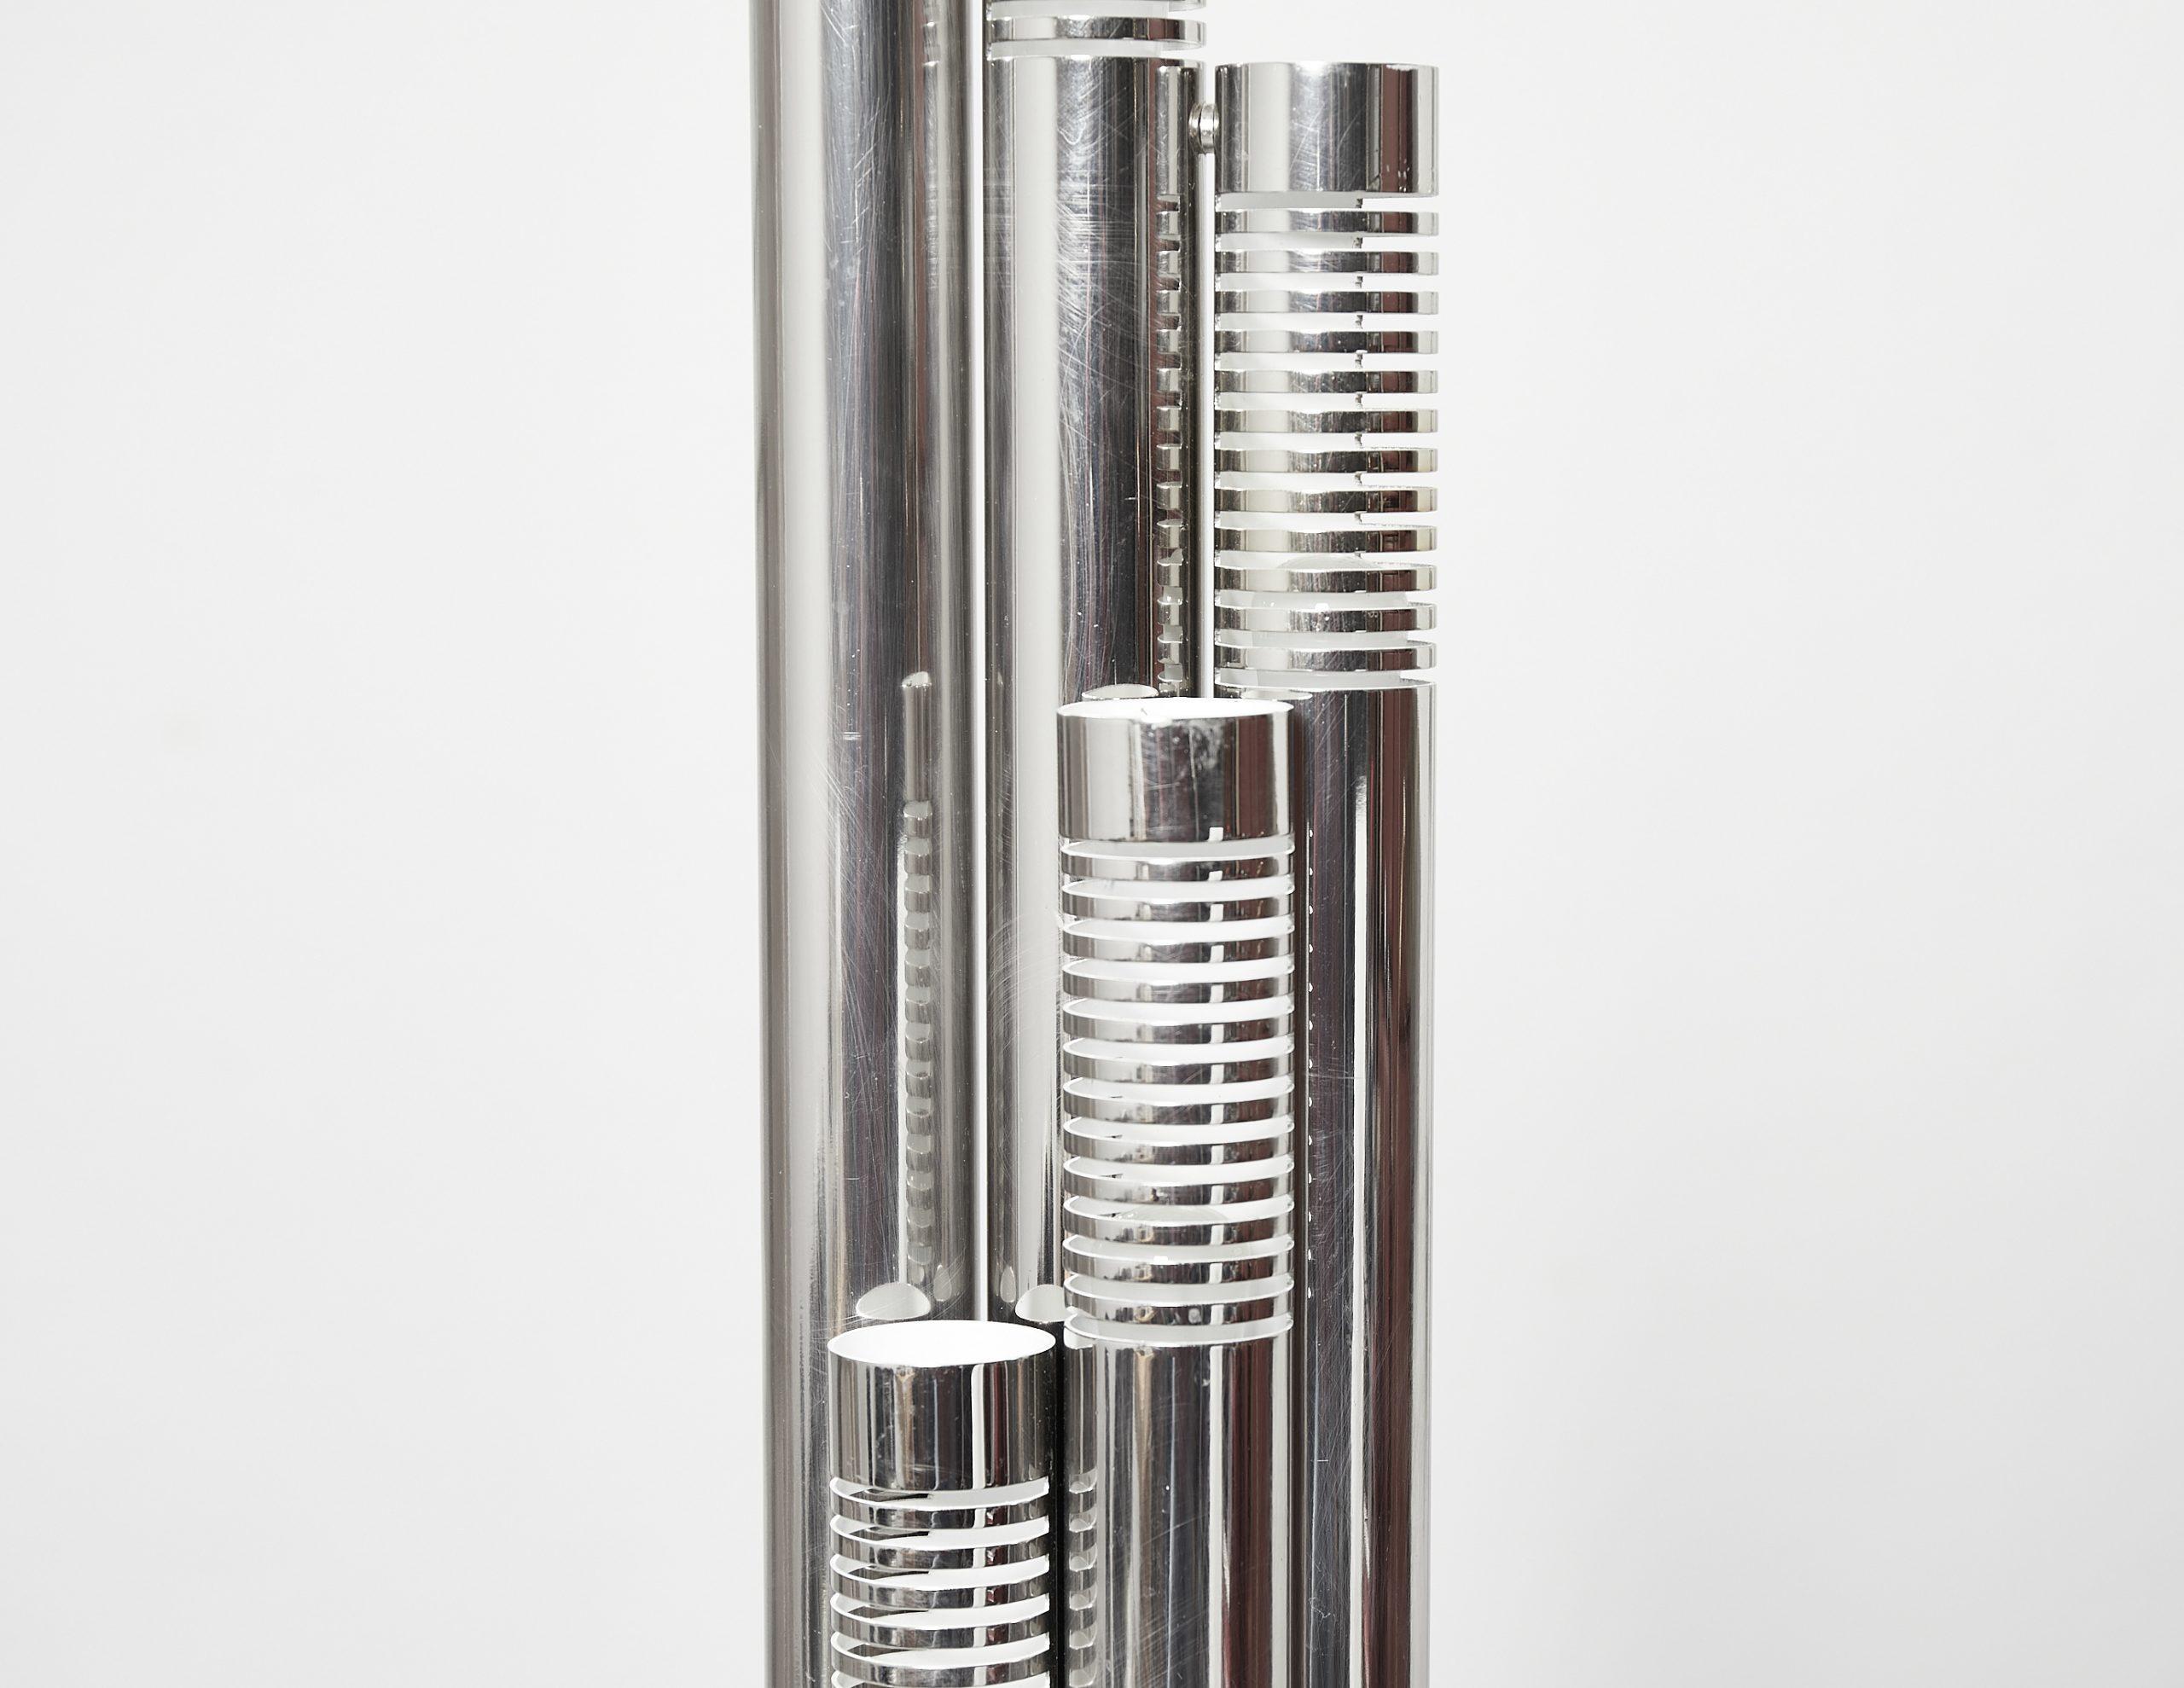 italian-chromed-metal-tubular-table-lamp-c-1970-image-06